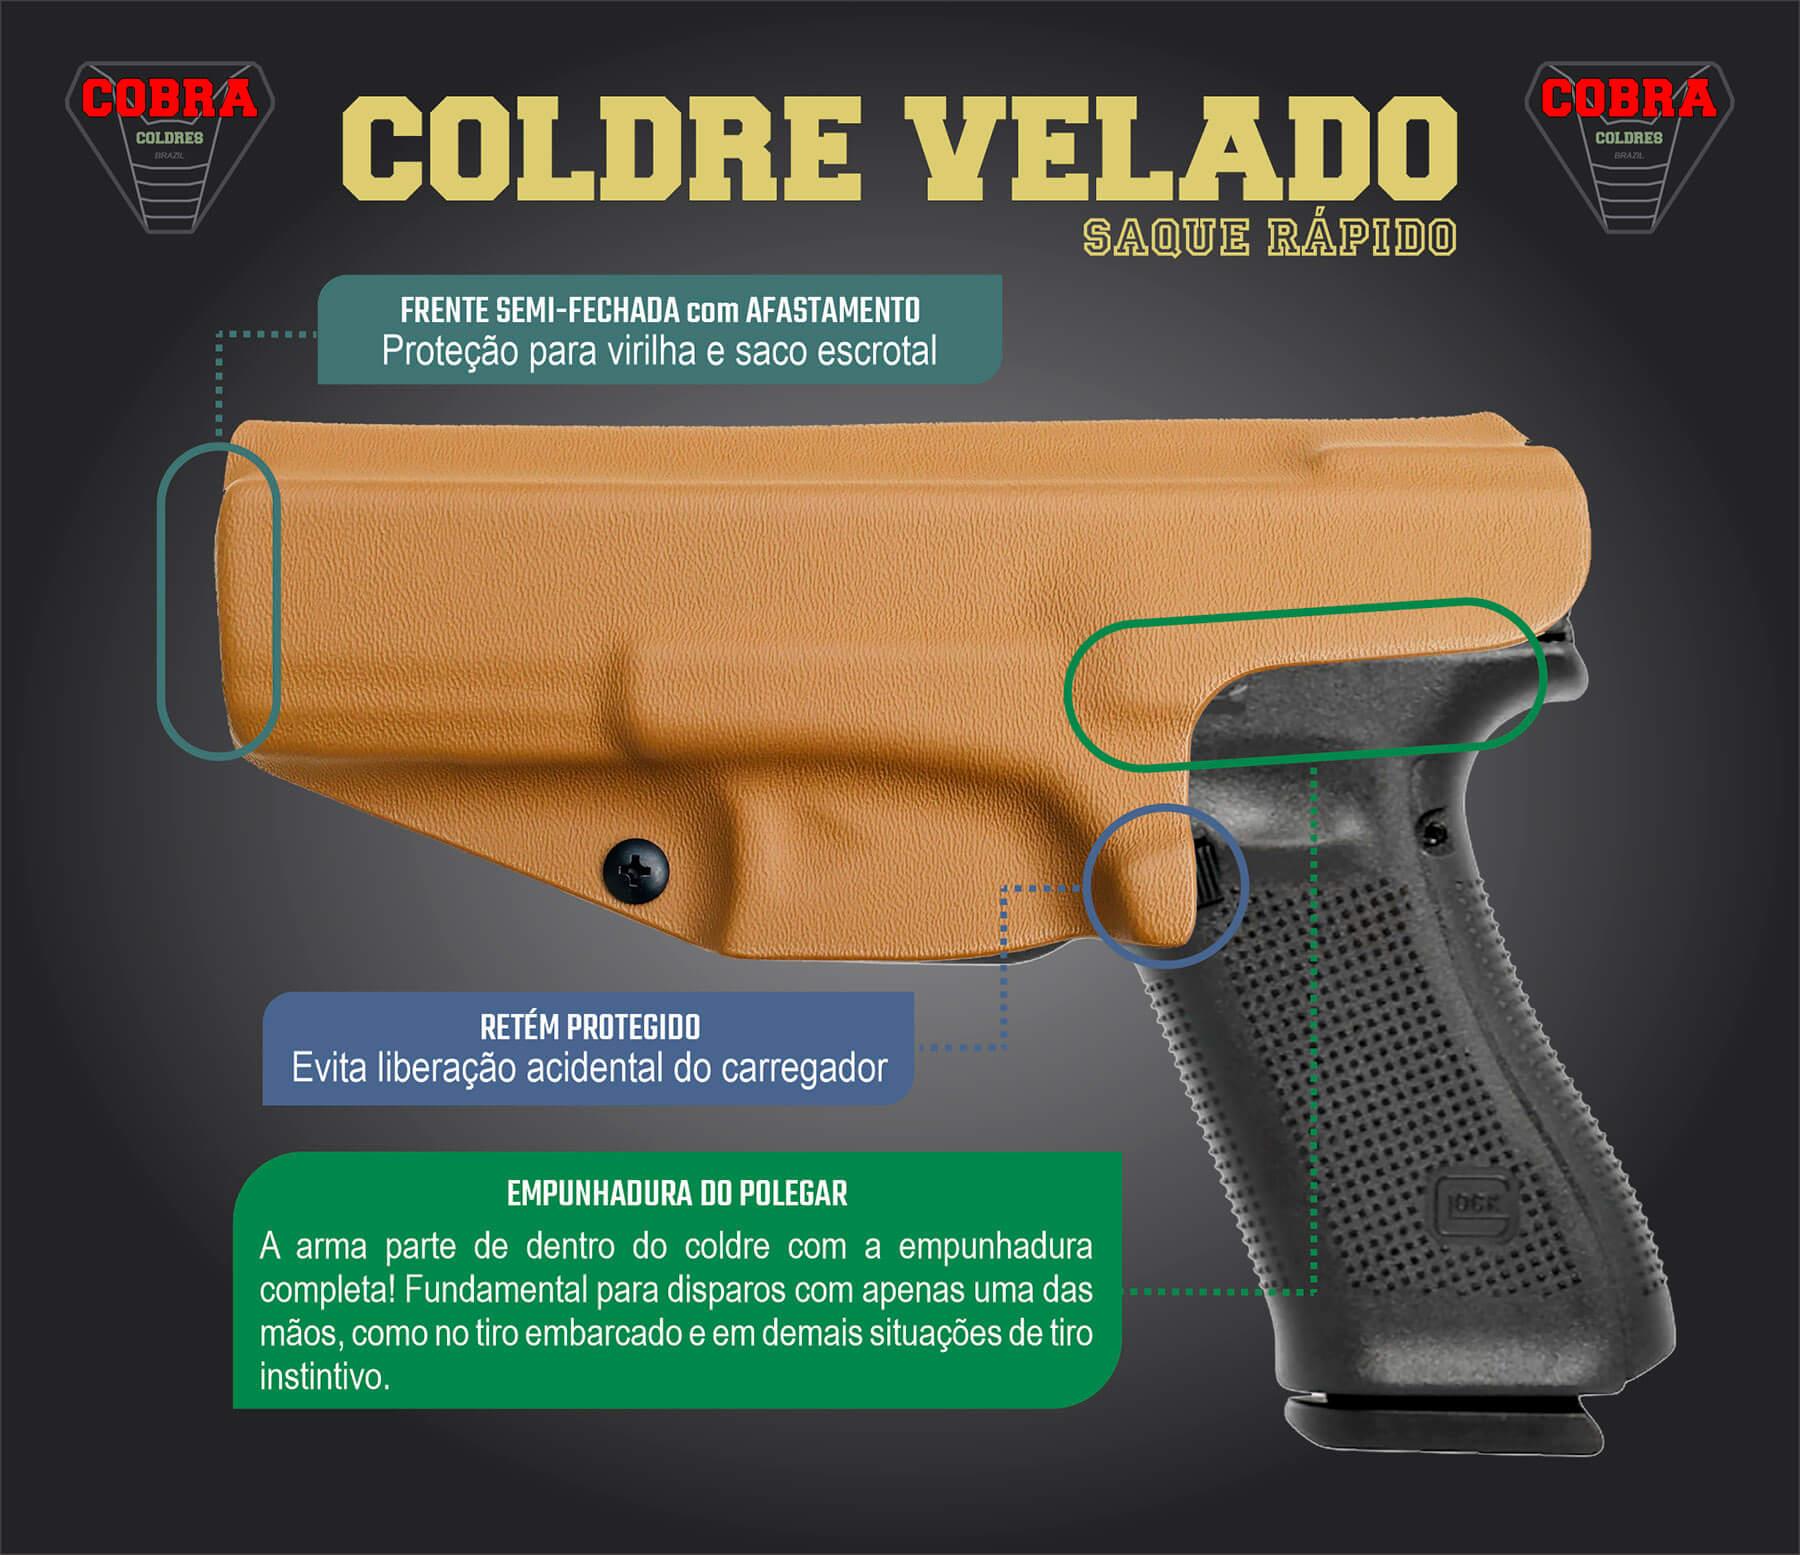 Coldre [TH9c] [TH40c] [TH380c] [PT838c] Kydex +  2 Porta-Carregadores Universais - Saque Rápido Velado Kydex® 080